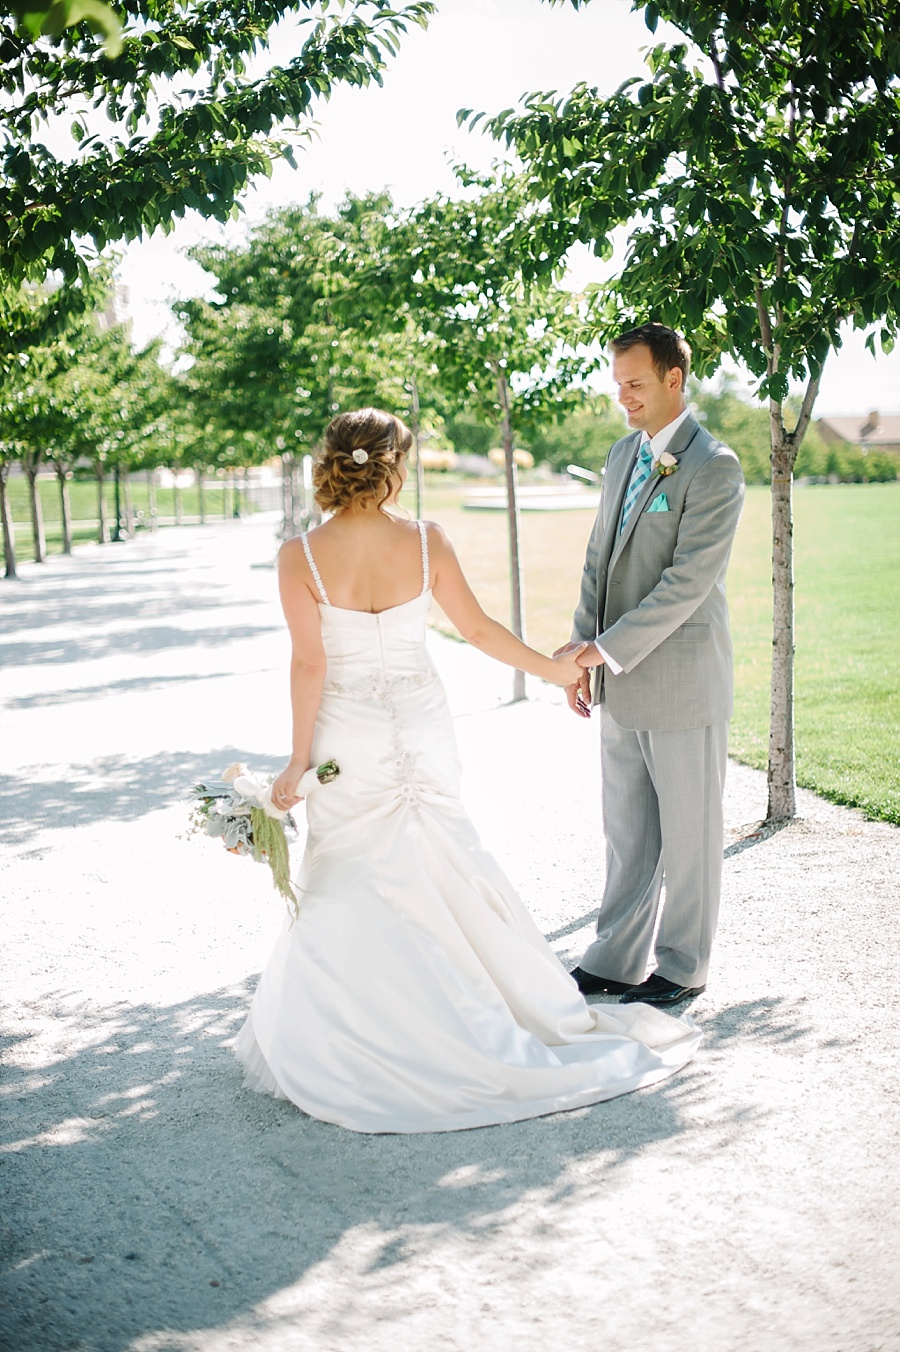 SLC Wedding Photographer Ali Sumsion 1135